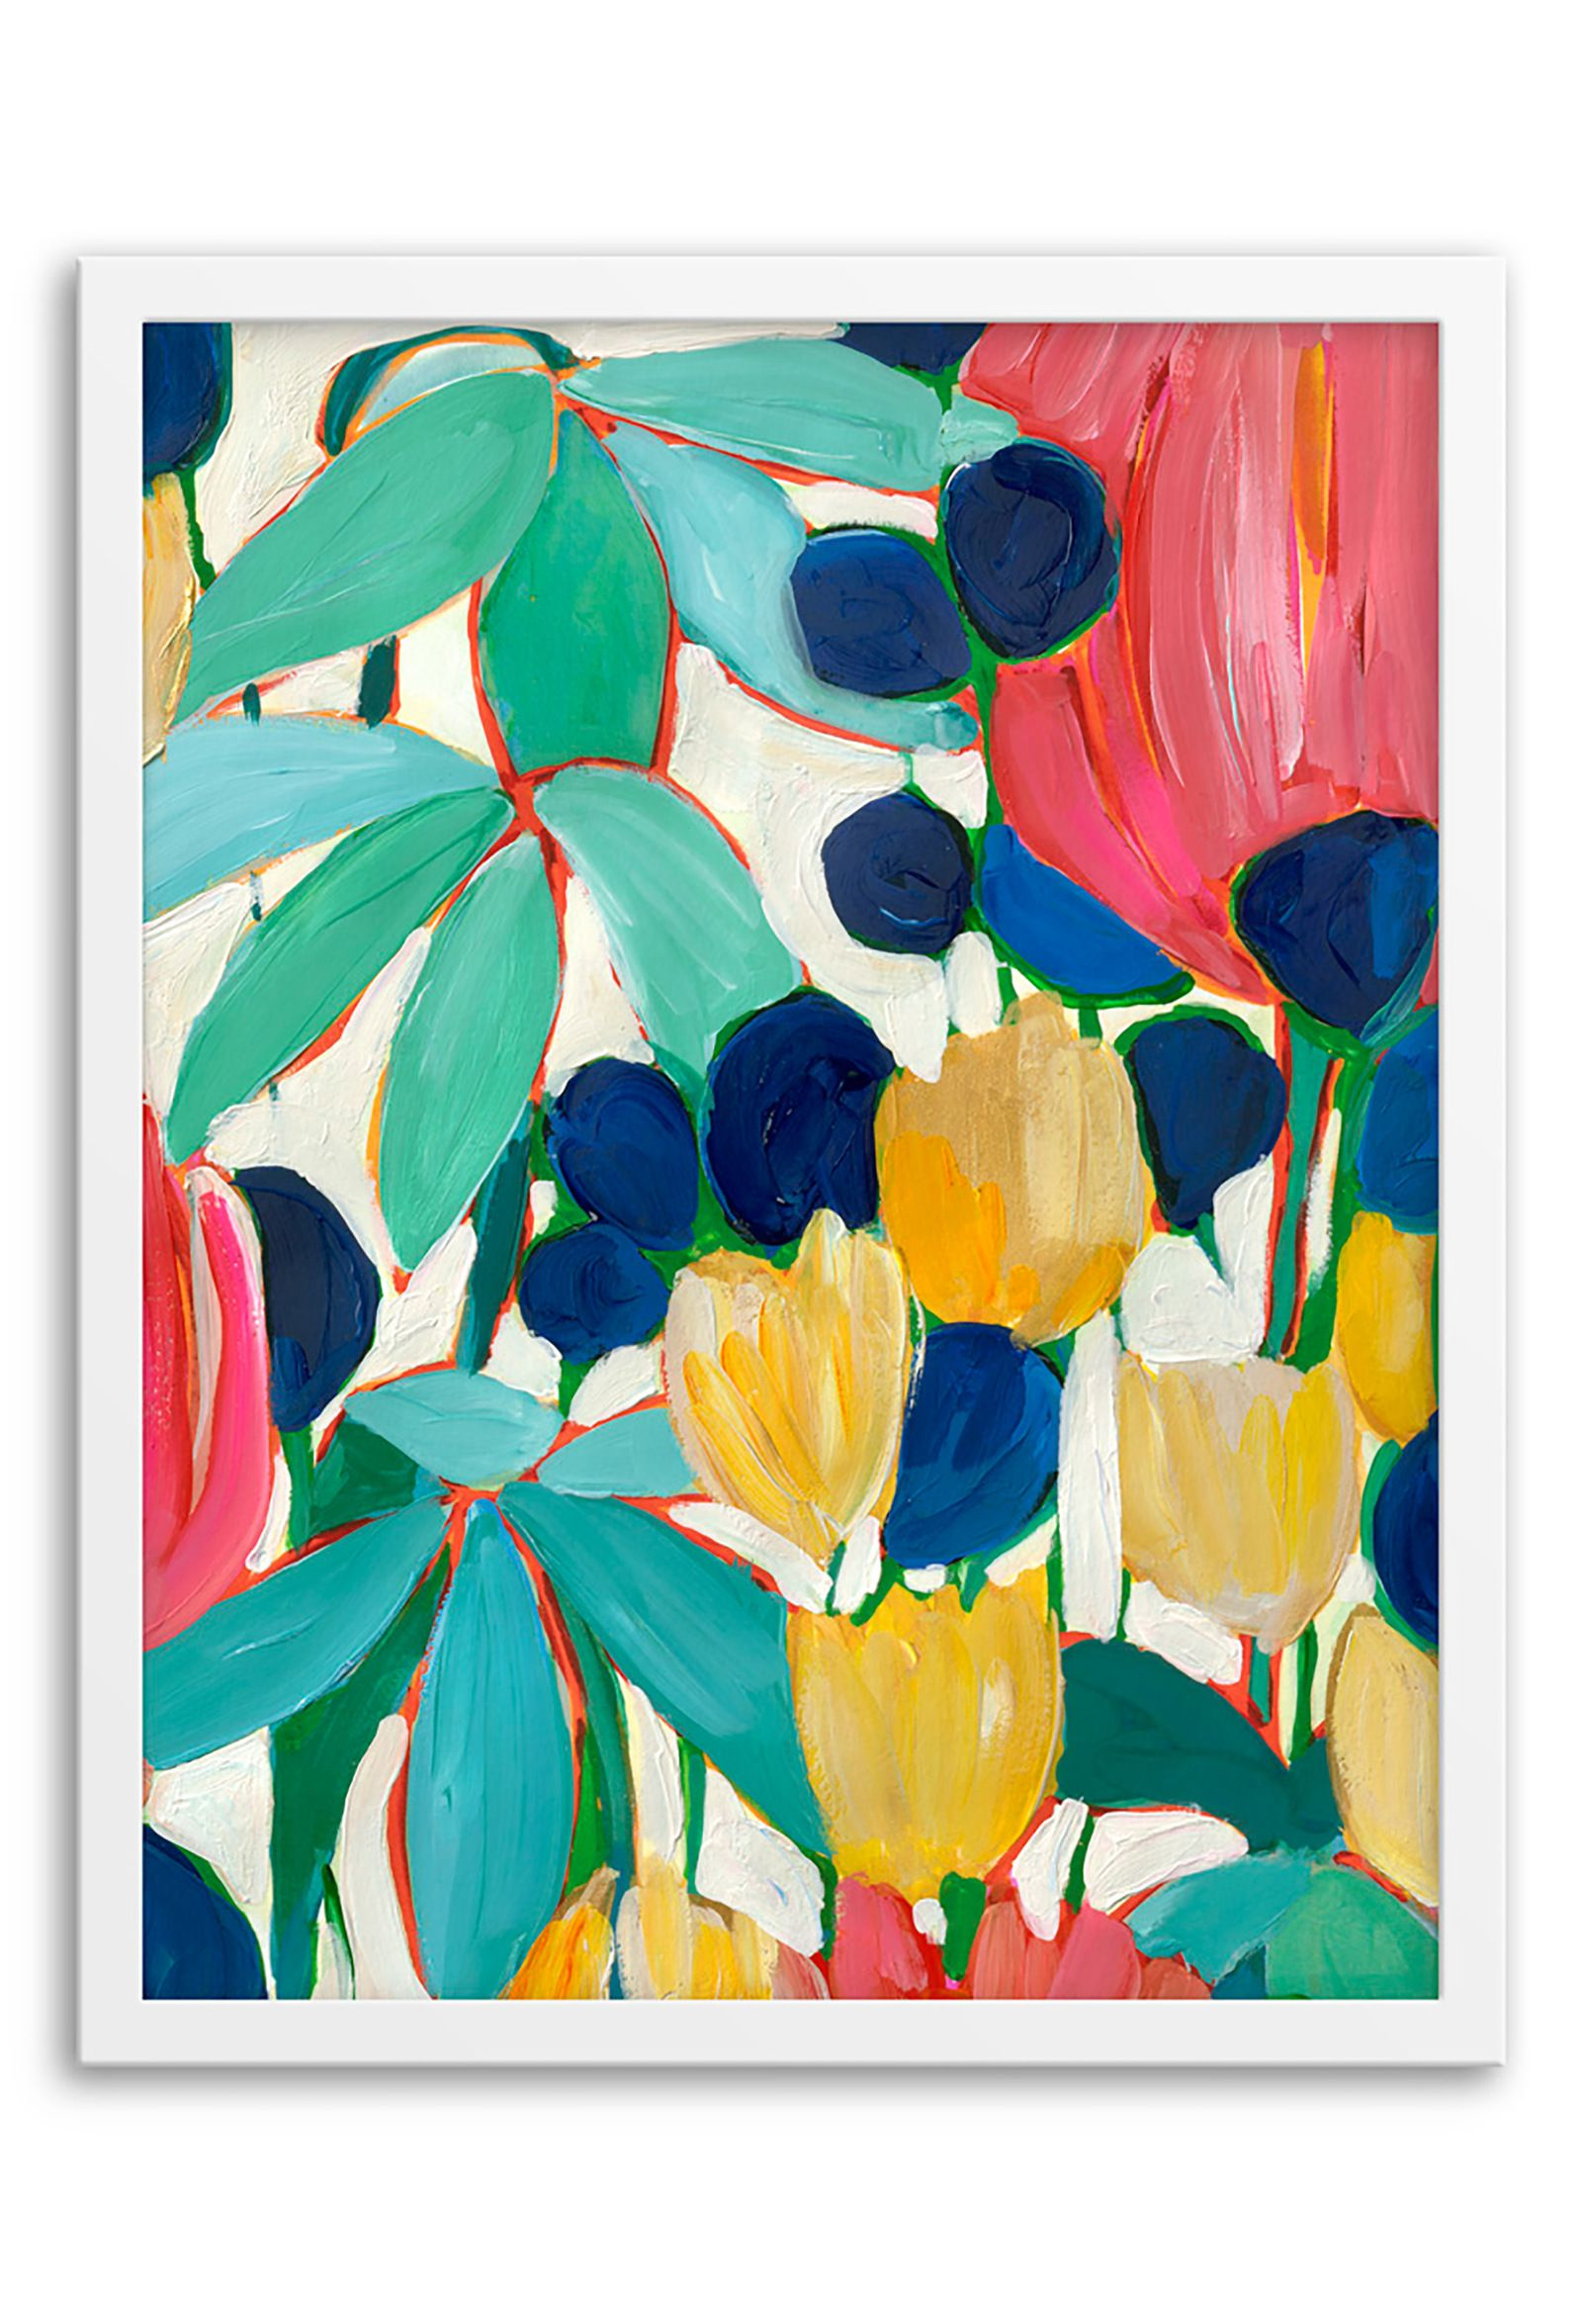 Lulu DK | | a r t | | Pinterest | Ilustraciones y Arte